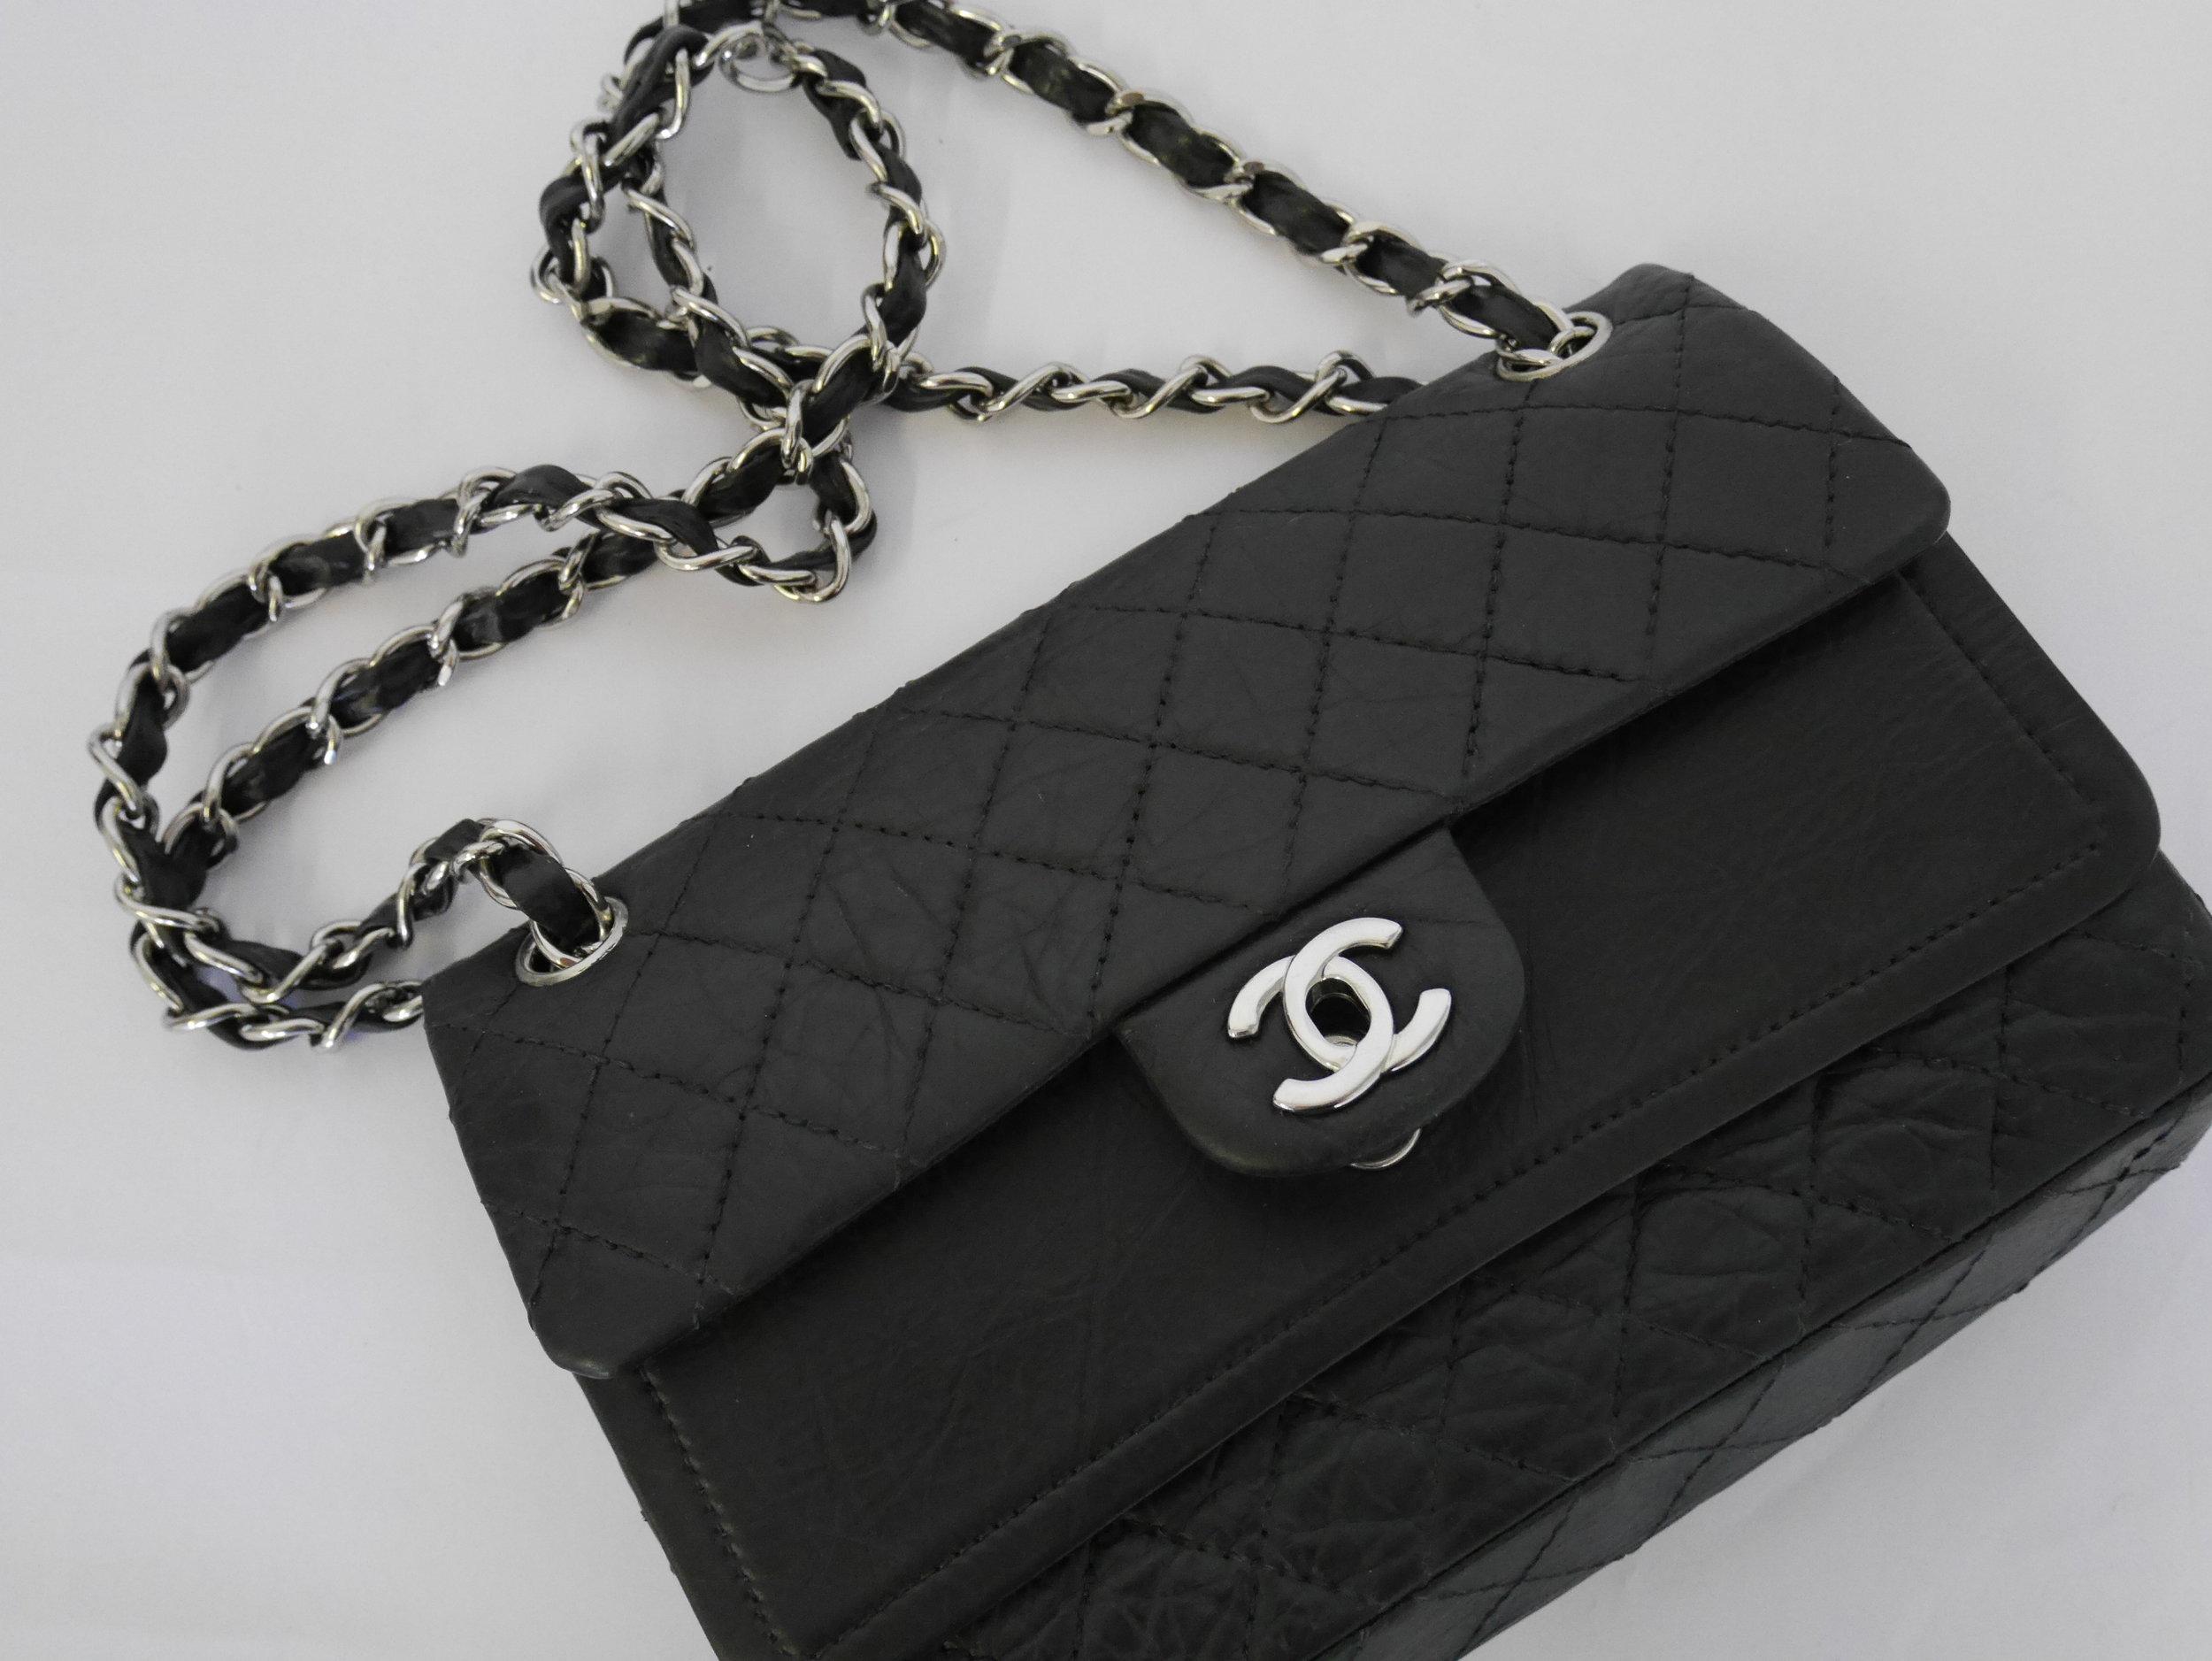 Restored Chanel Bag